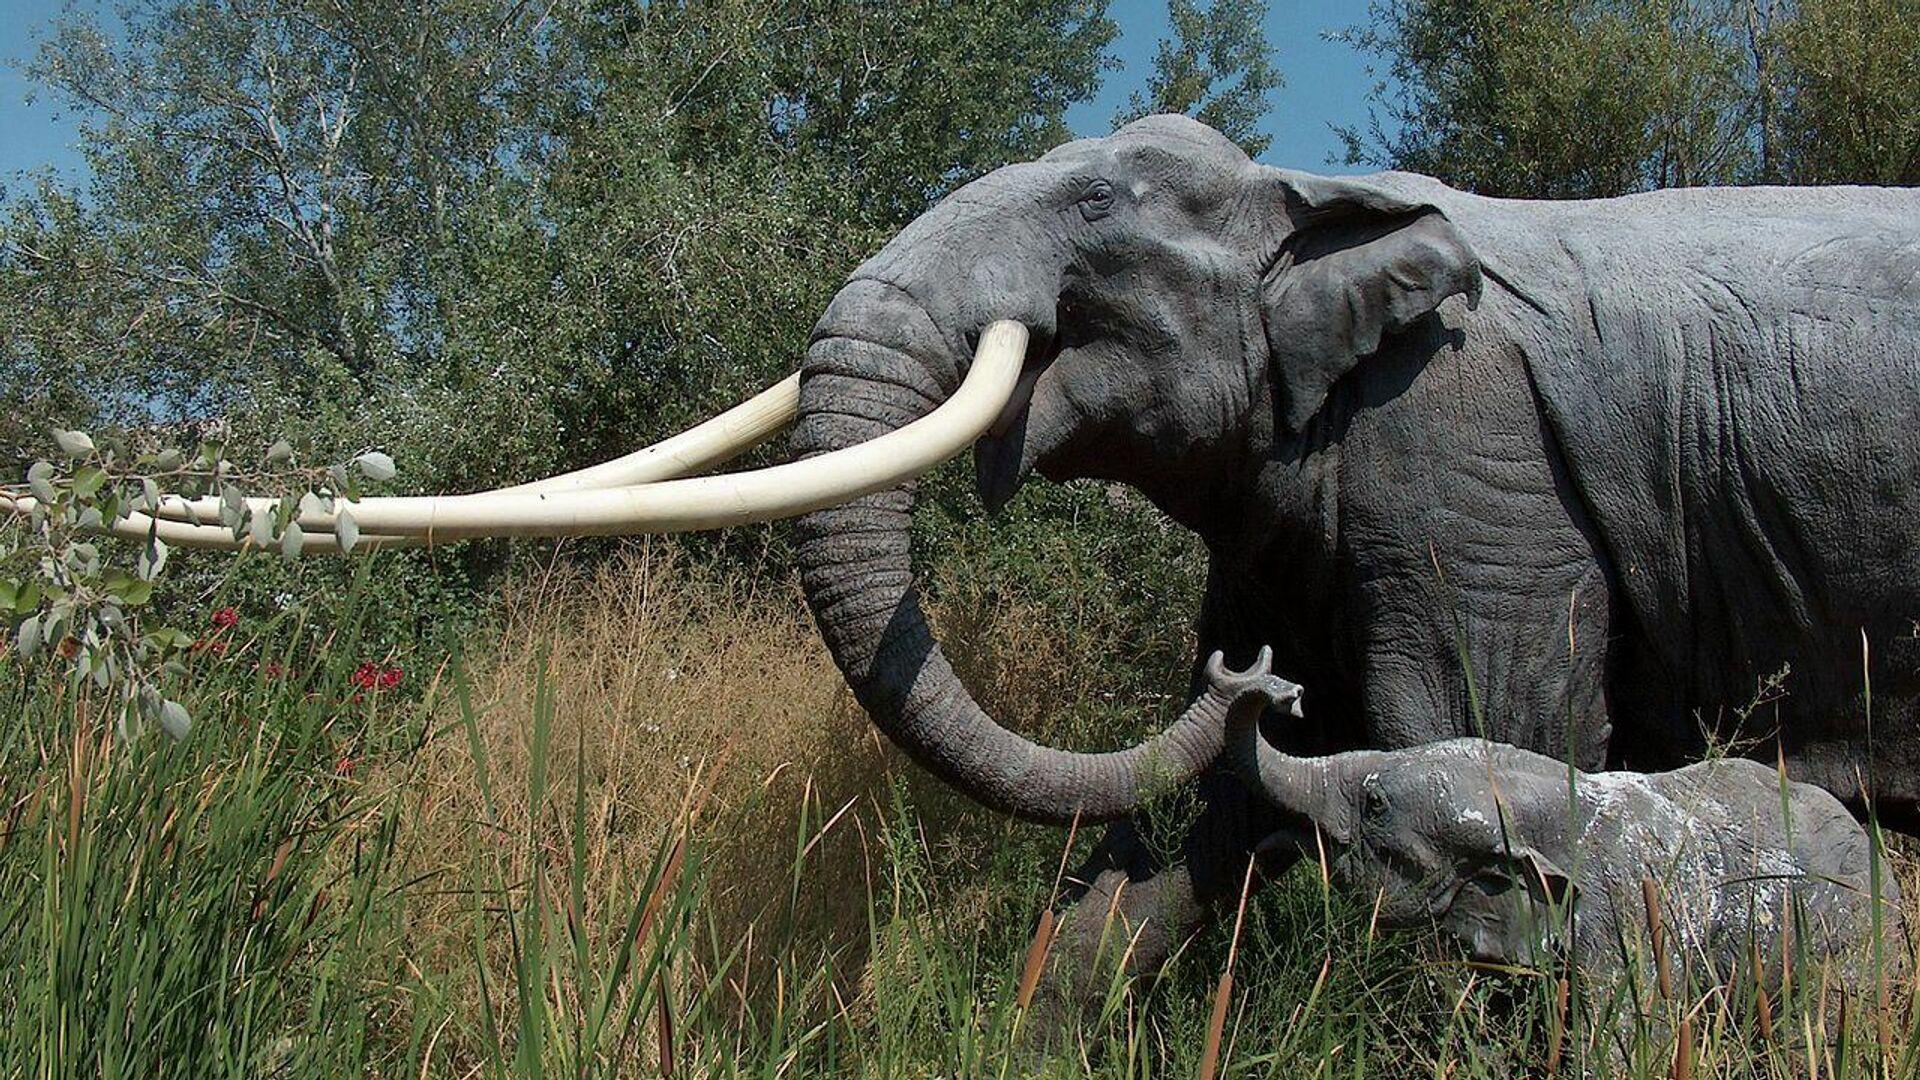 Palaeoloxodon antiquus - Sputnik Mundo, 1920, 18.09.2021